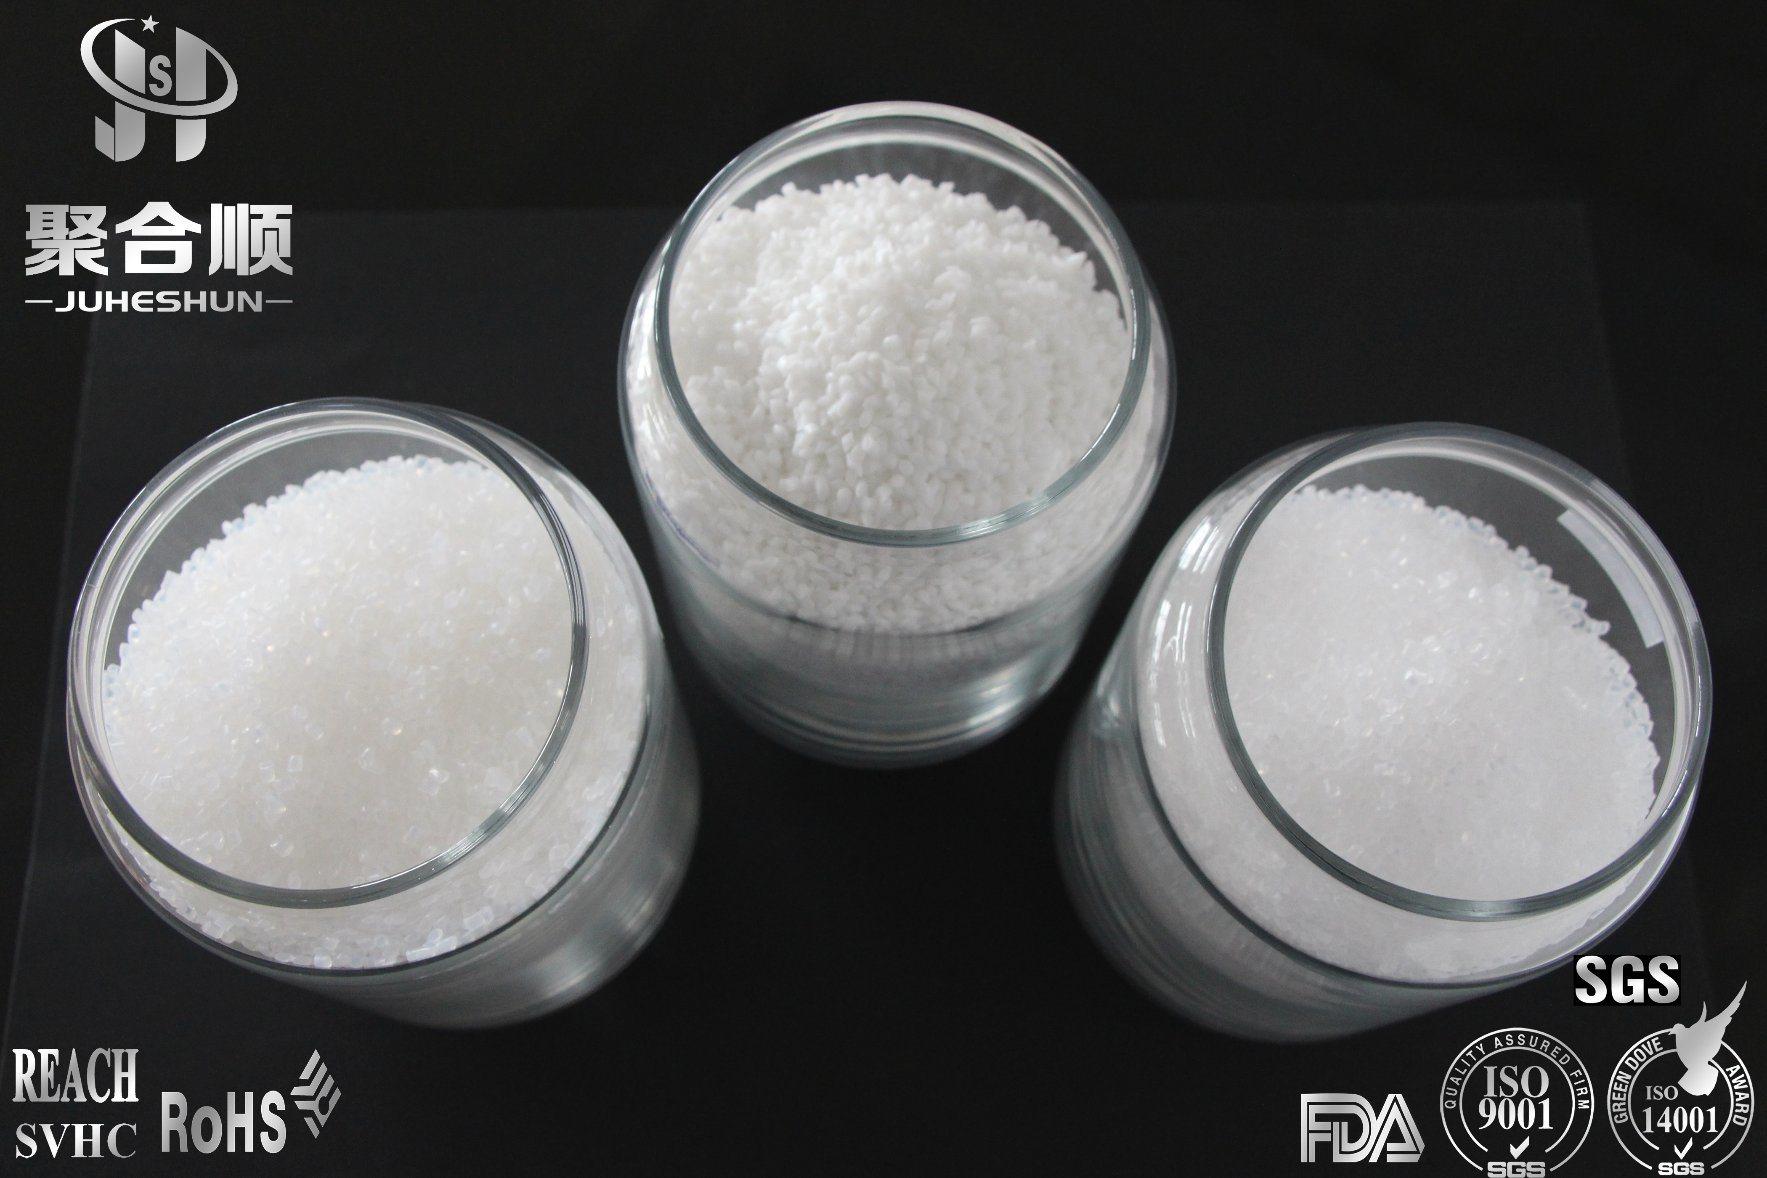 J2800f/Film Grade PA6 Granules/Nylon6/Polyamide Chips/Pellets/PA6/Nylon6 Granules/Polyamide 6